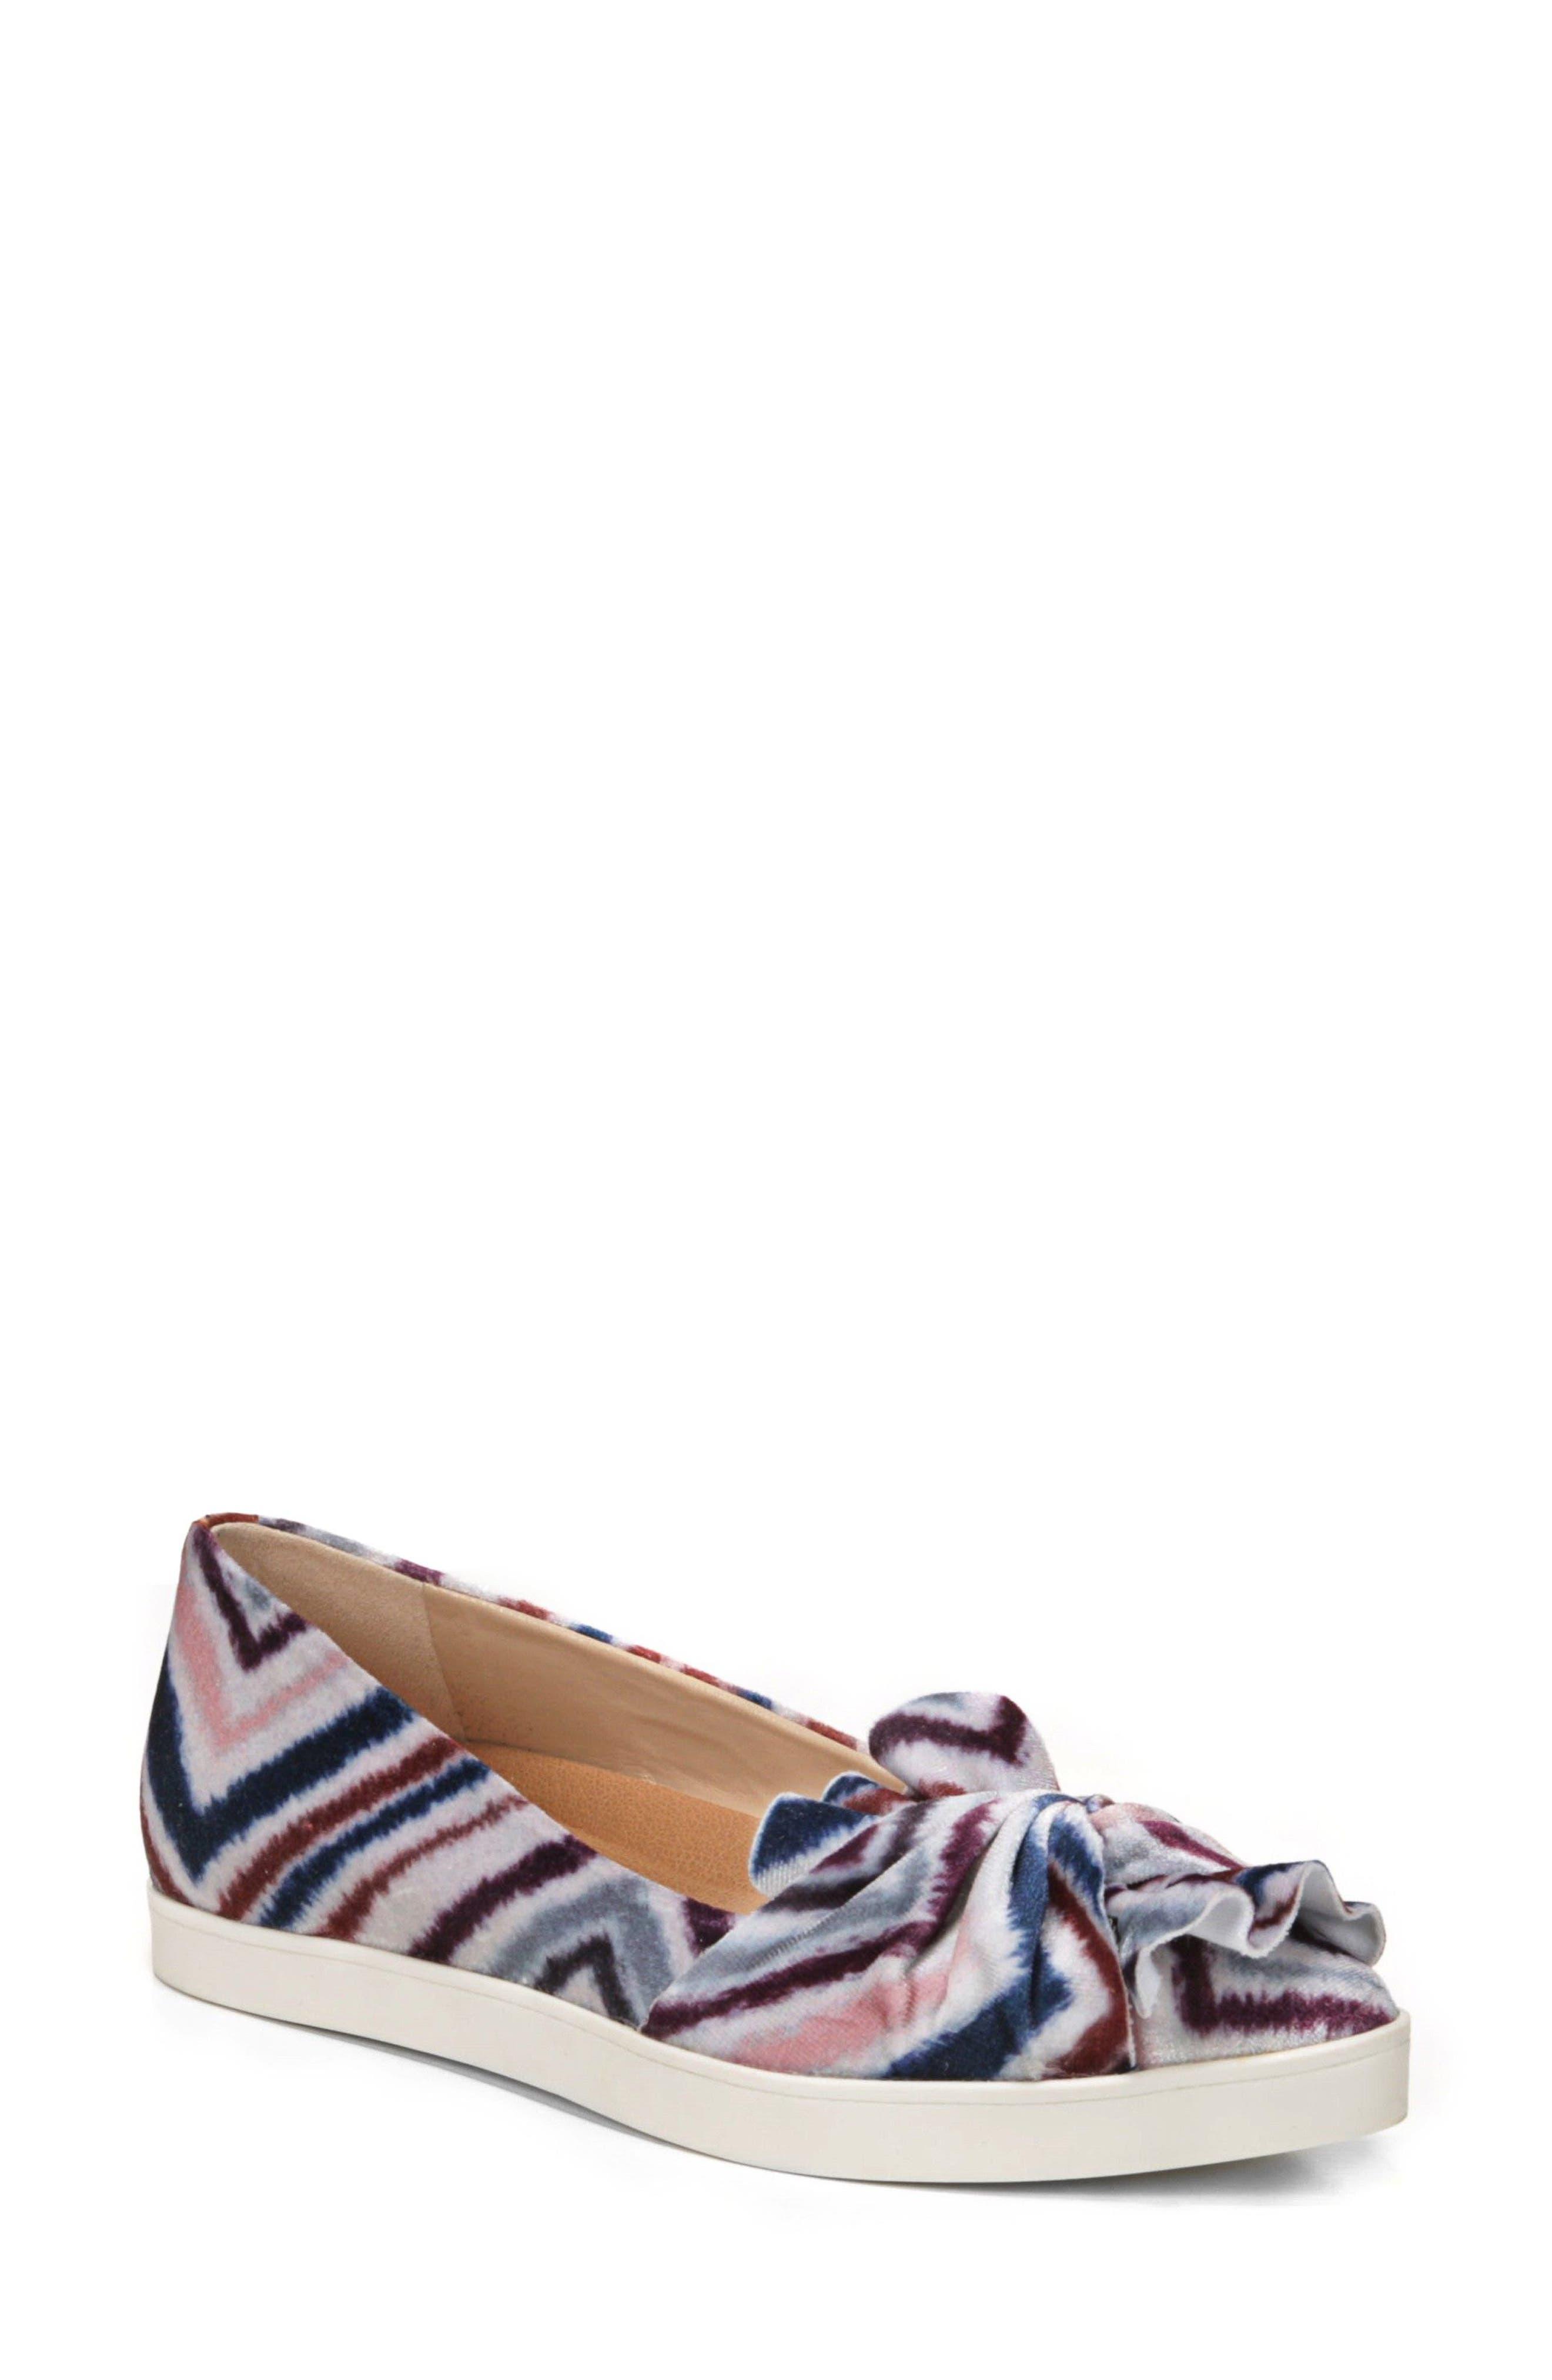 DR. SCHOLLS Viv Knotted Sneaker